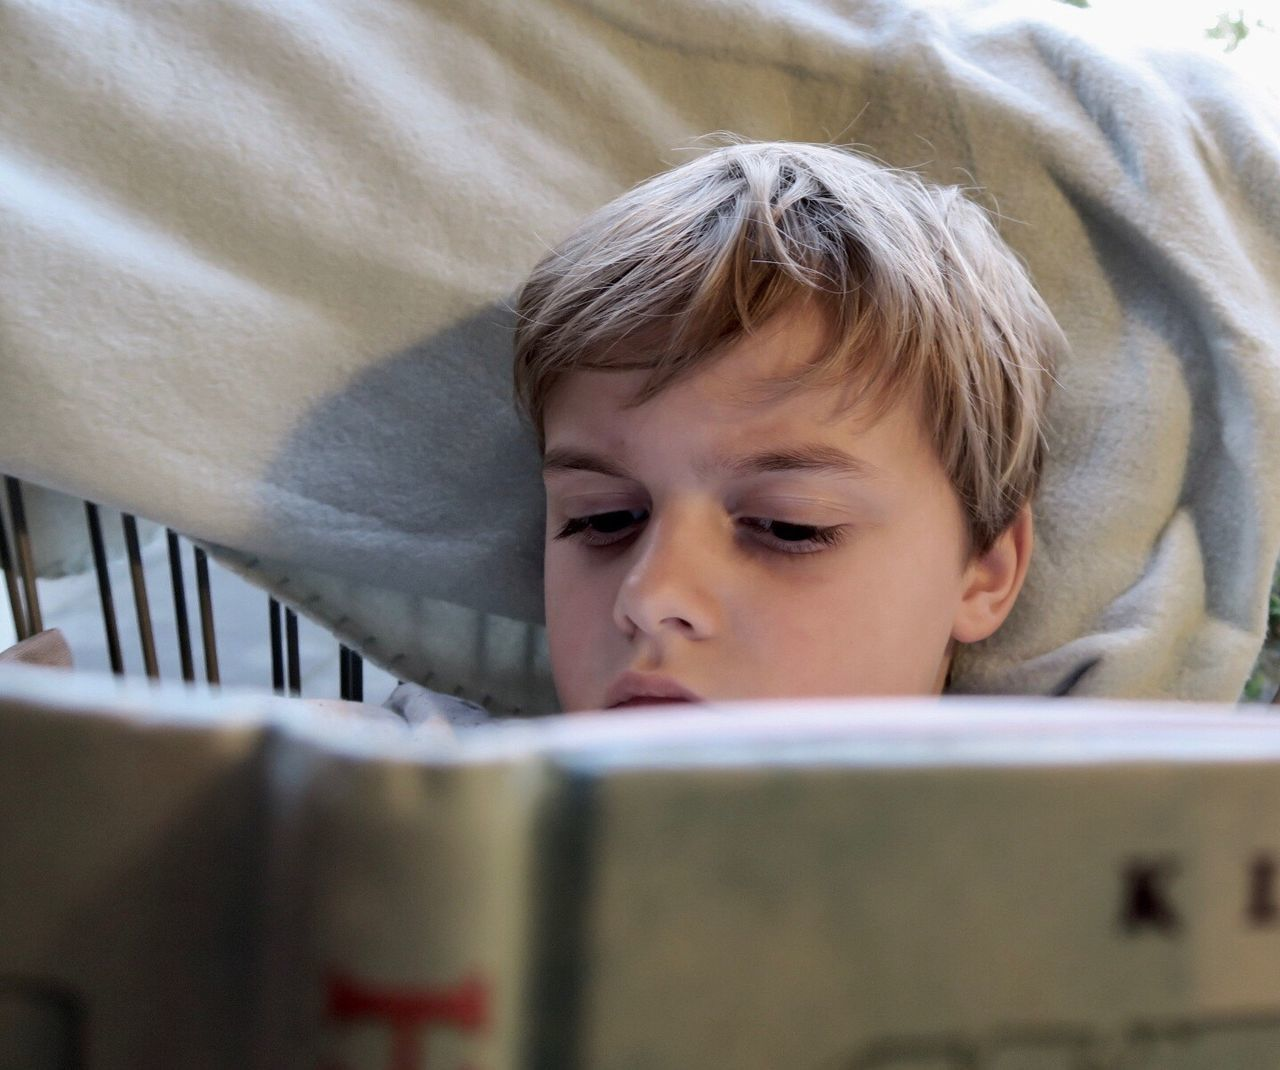 Reading Books Child Childhood Important Inthemoment Close-up Dof